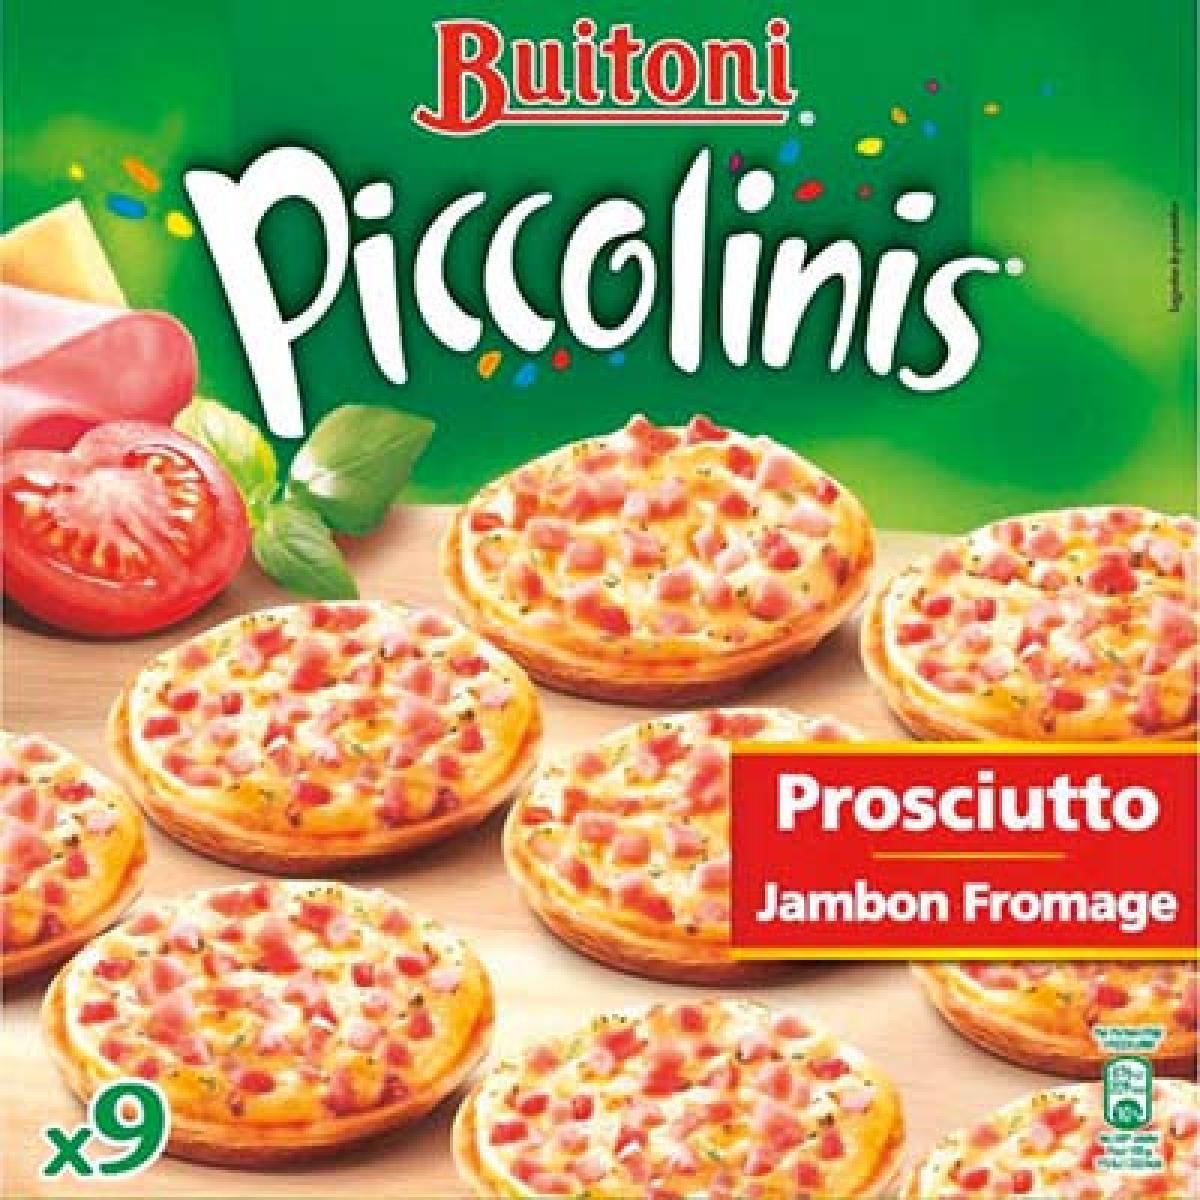 PICCOL.JAM/FR.X9 270G BUI